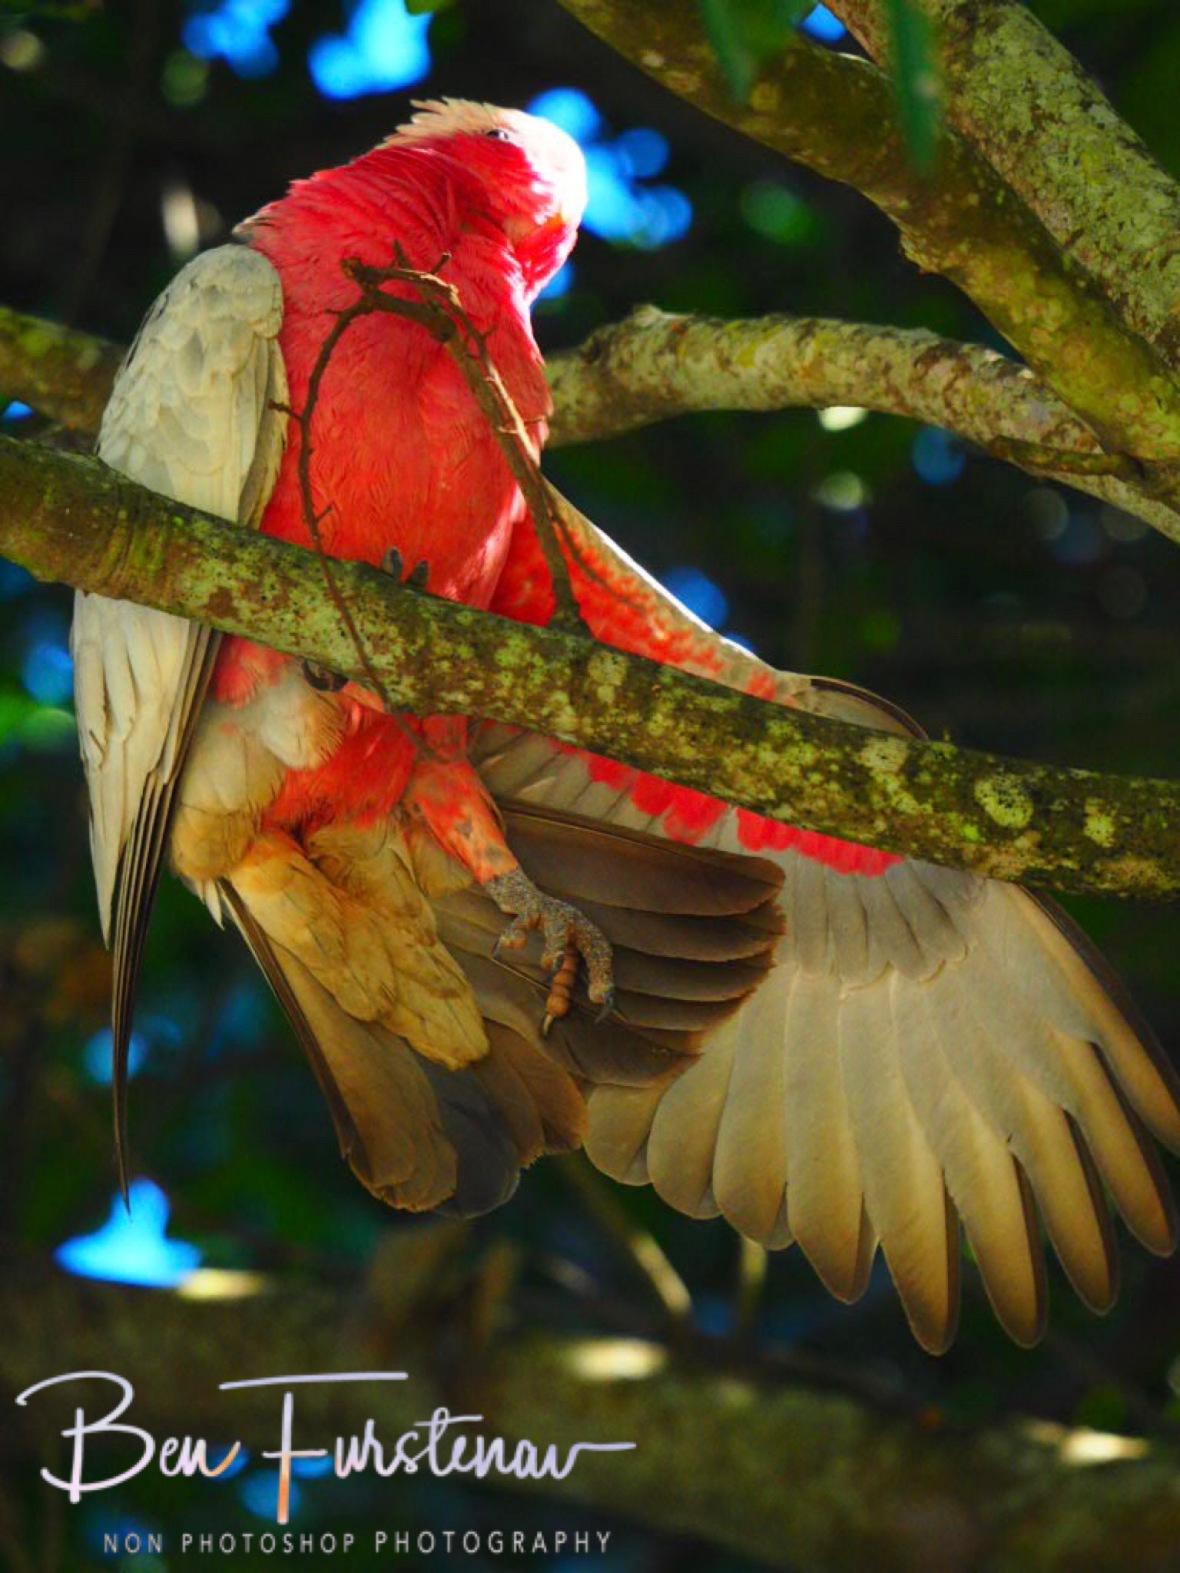 Warm-ups @ Woody Head, Northern New South Wales, Australia